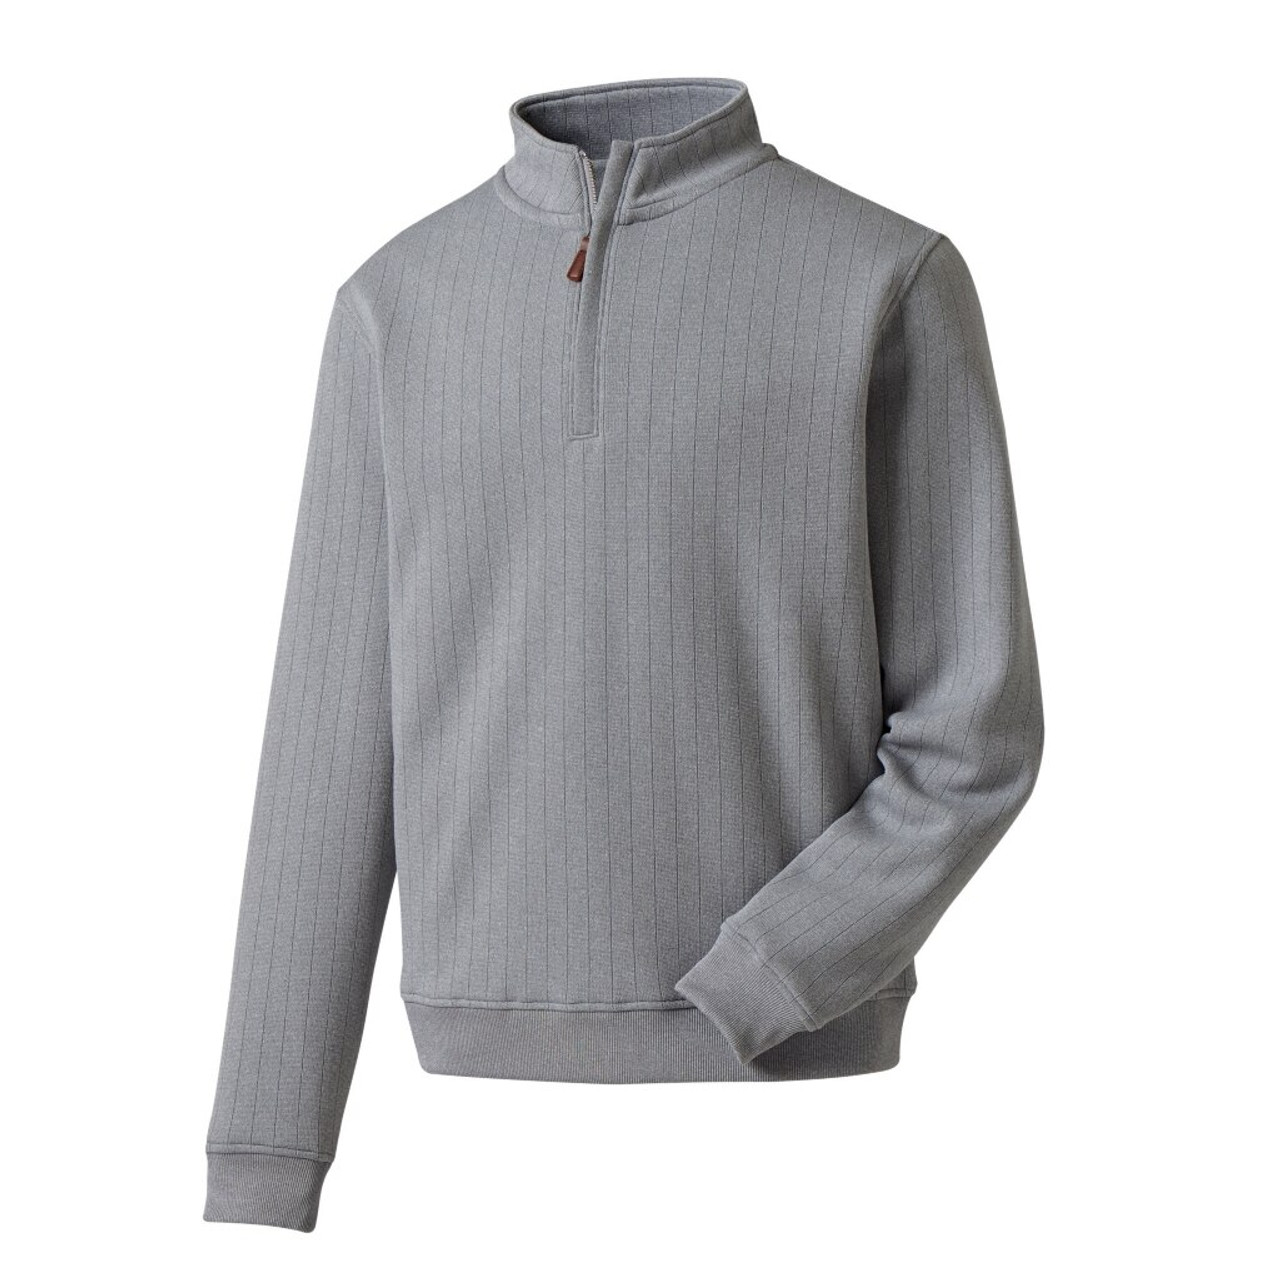 FootJoy Drop Needle Half-Zip Pullover - Heather Grey (27272)